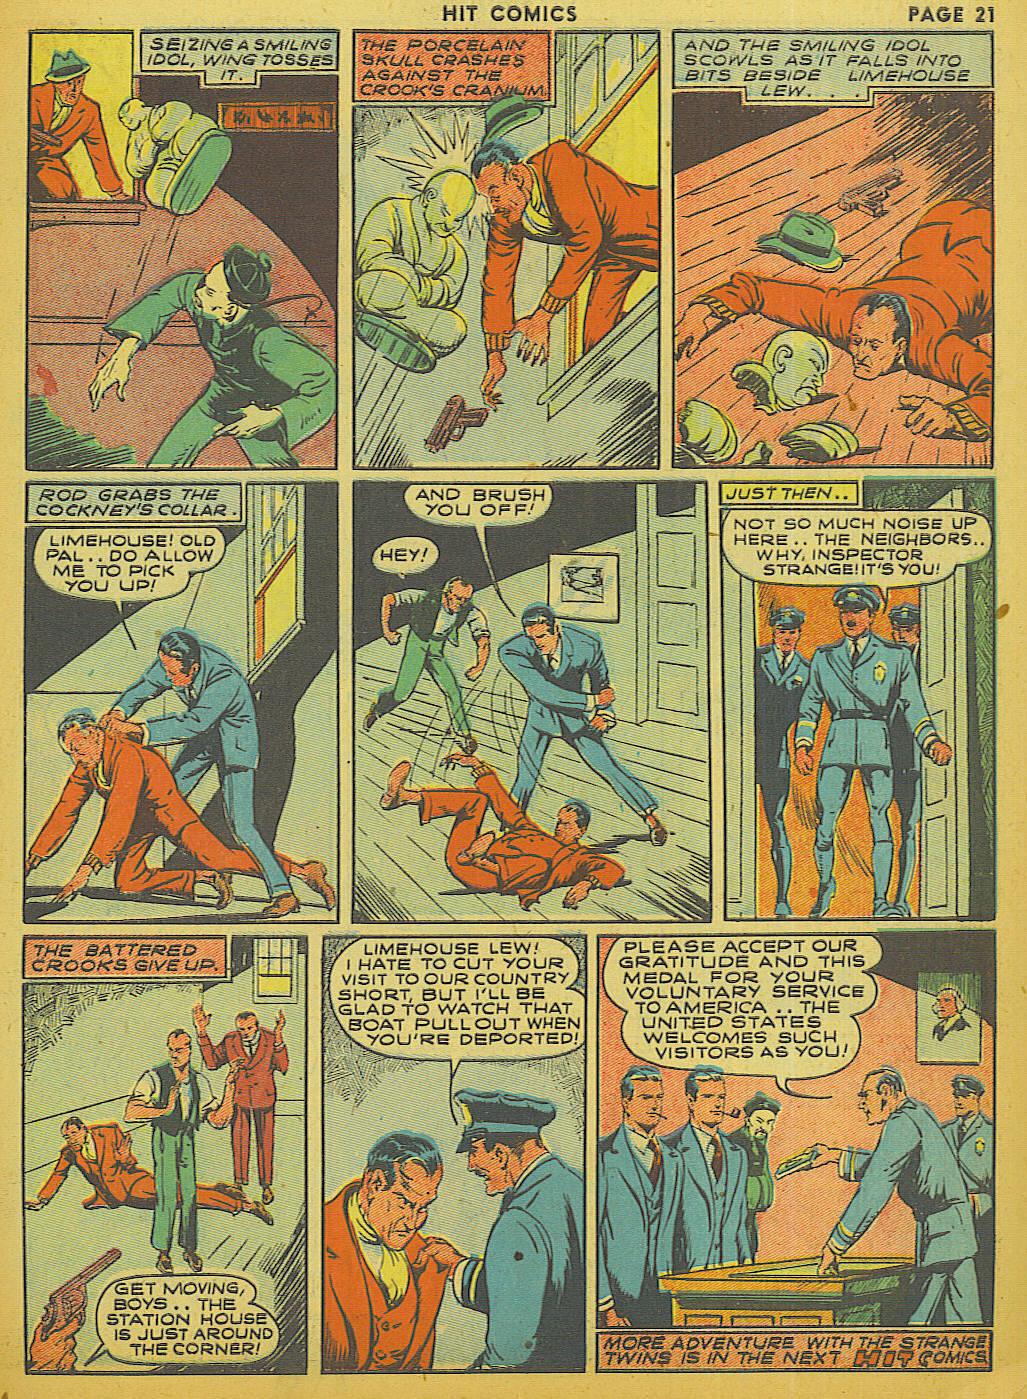 Read online Hit Comics comic -  Issue #13 - 23